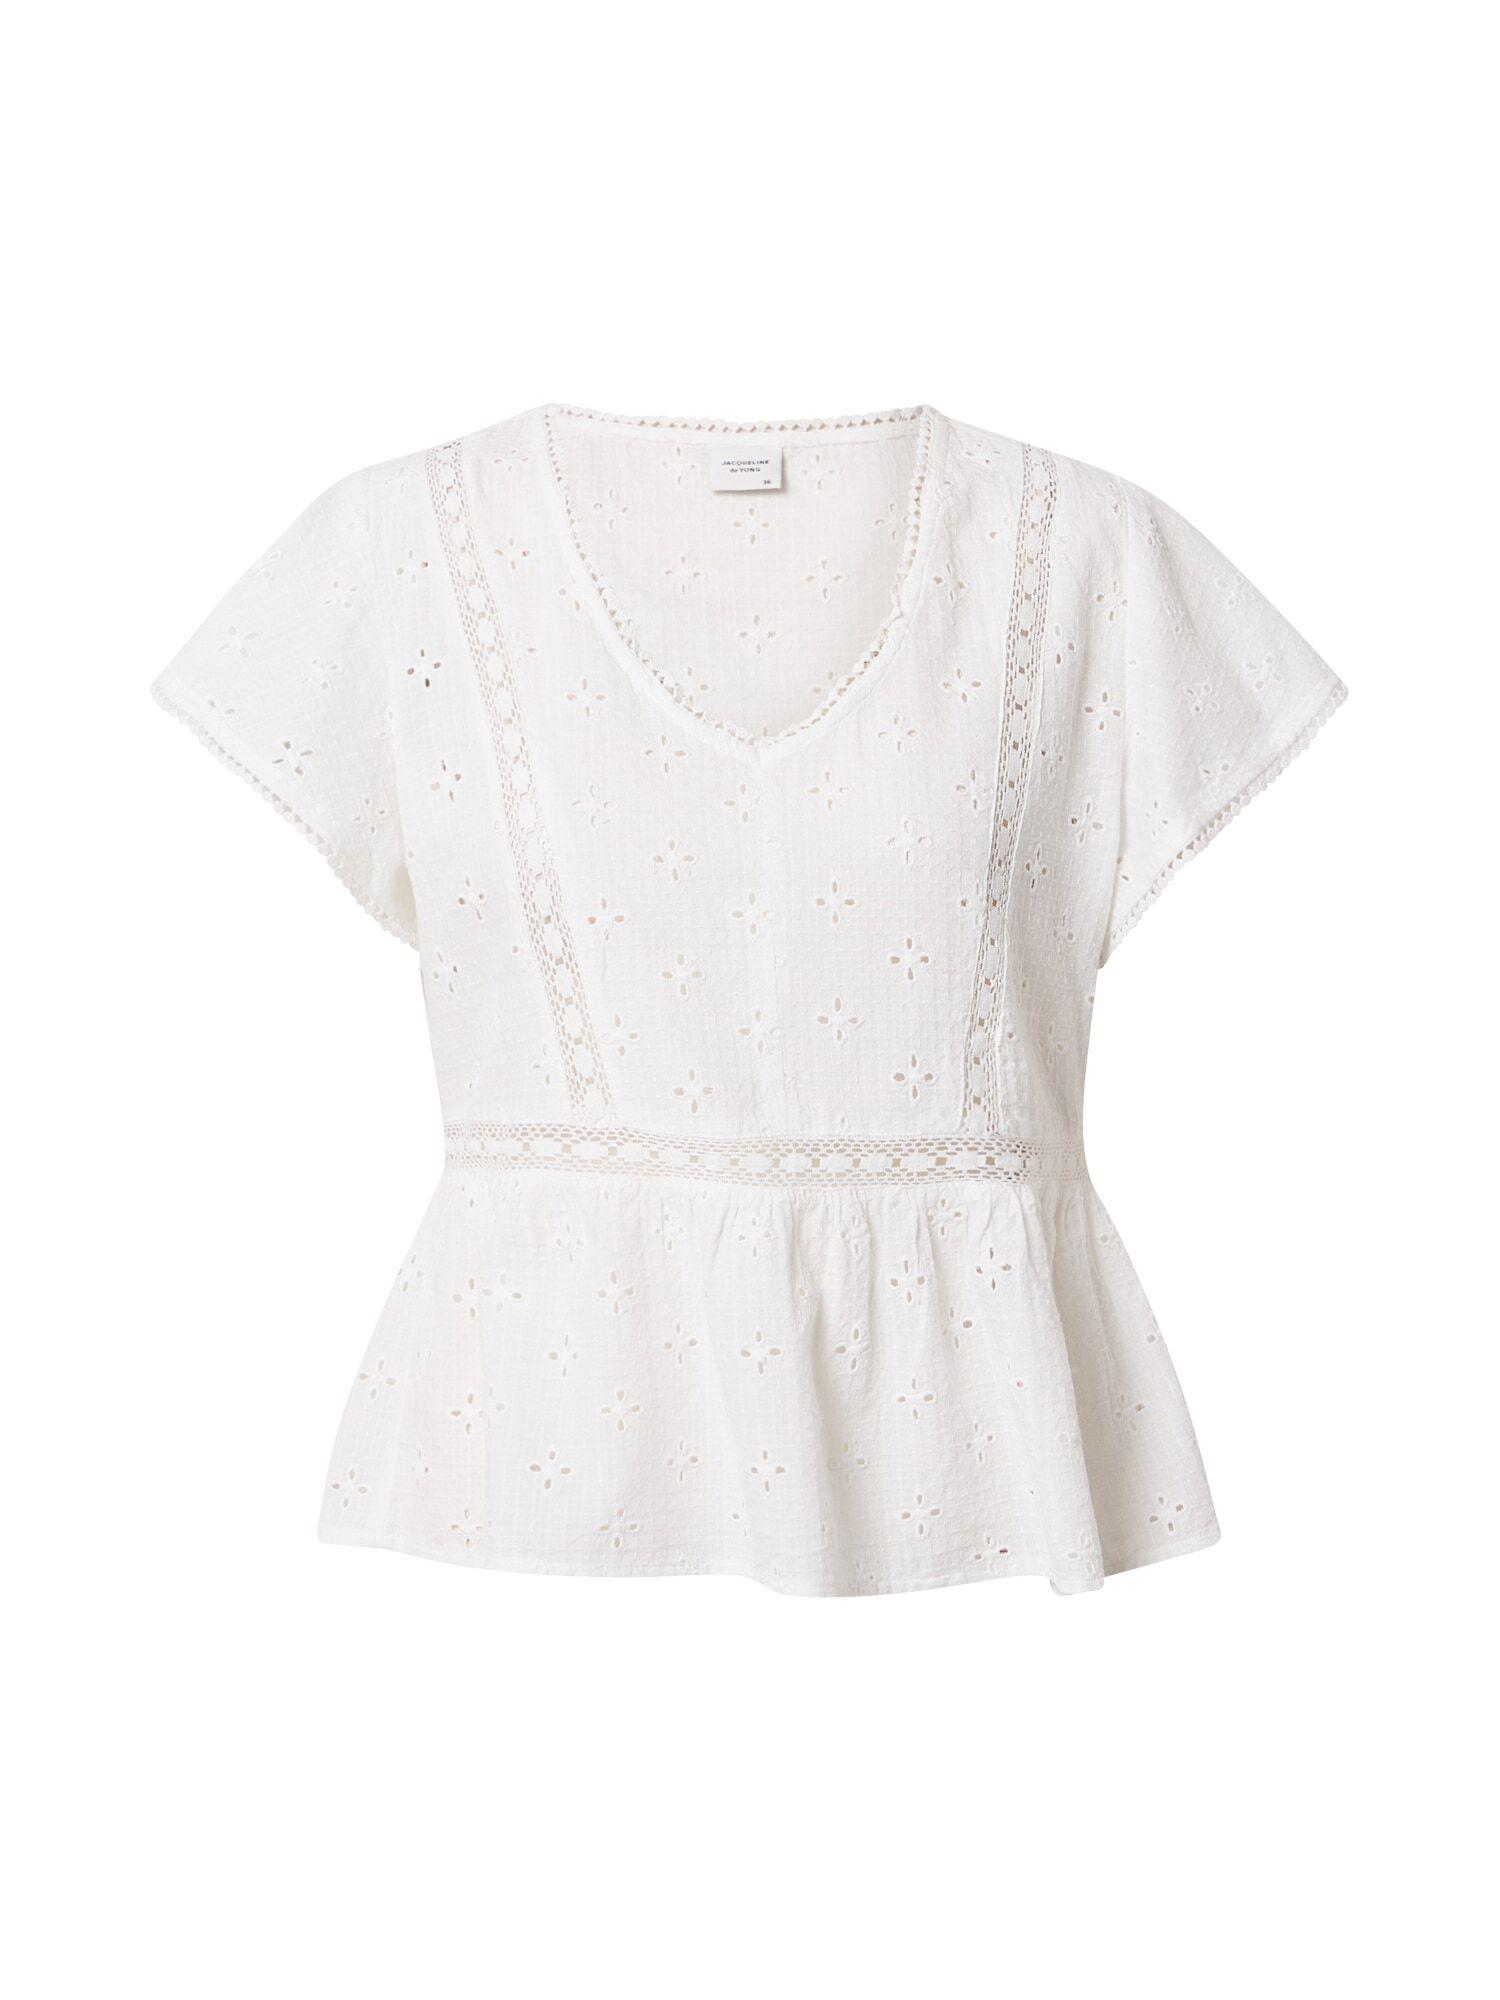 jdy camicia da donna 'vera' bianco